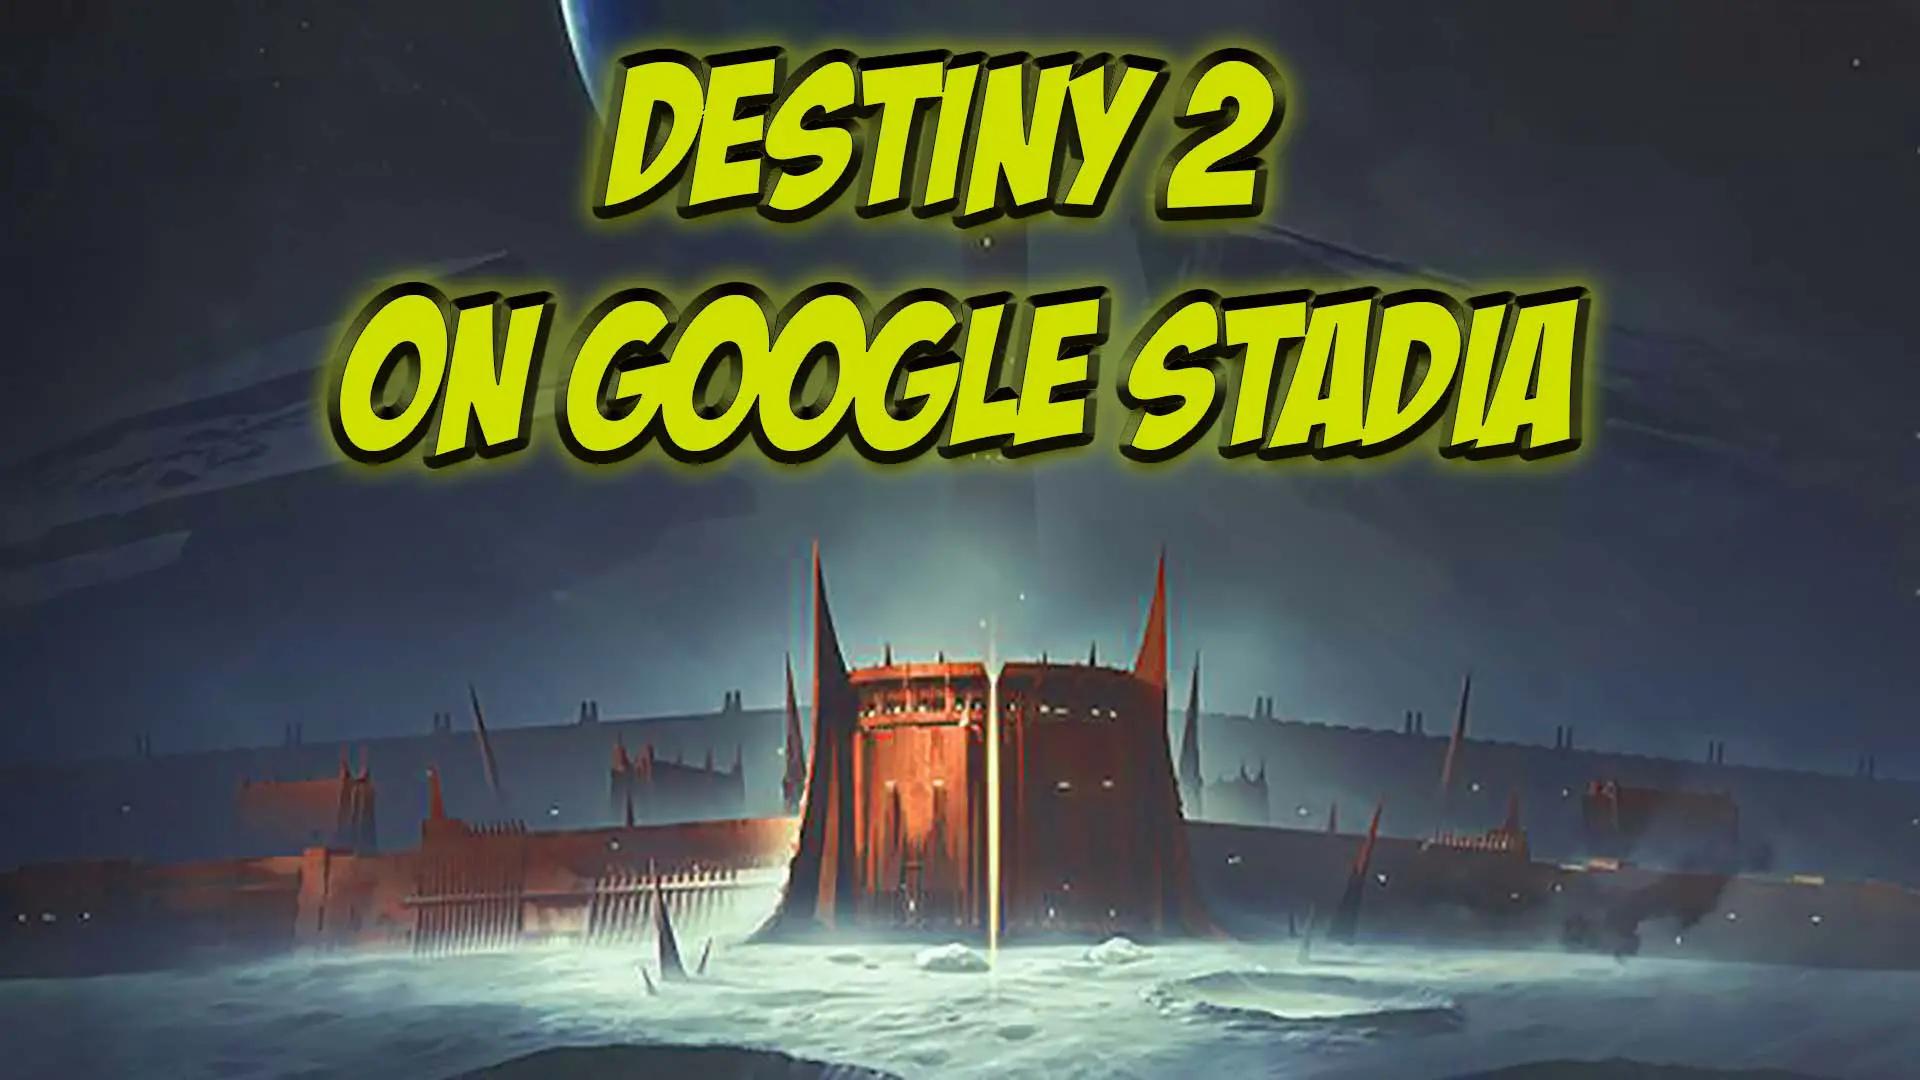 Destiny 2 on Google Stadia